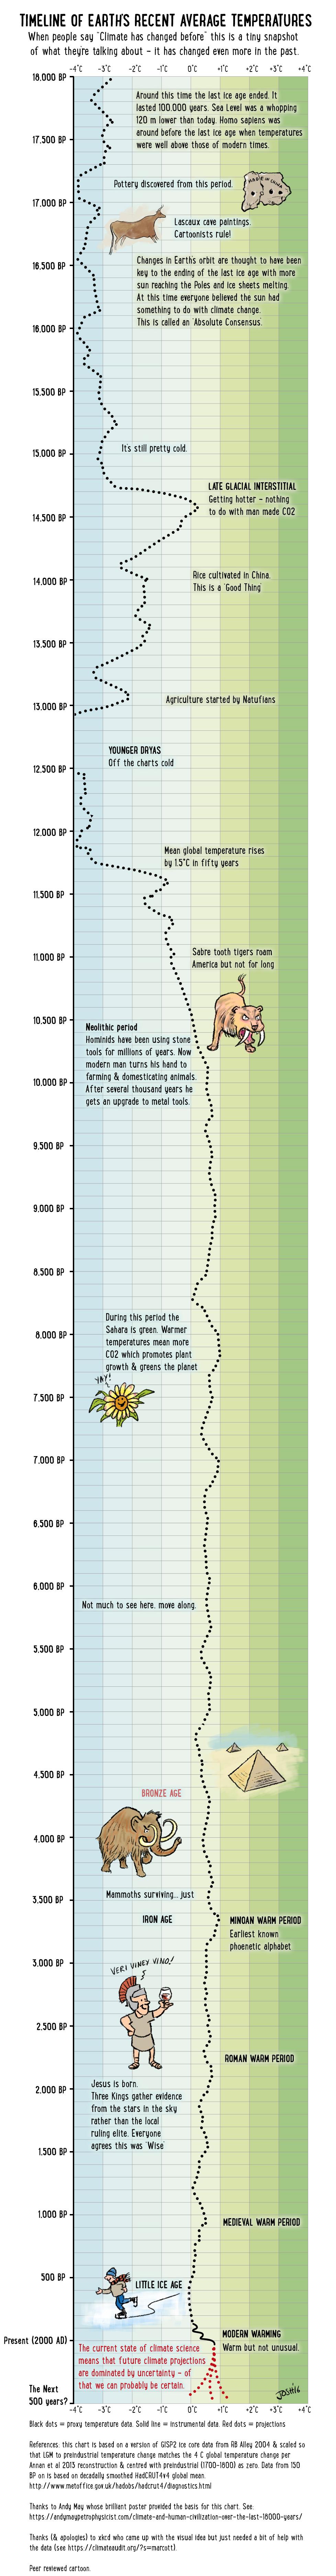 earth_timeline2.jpg